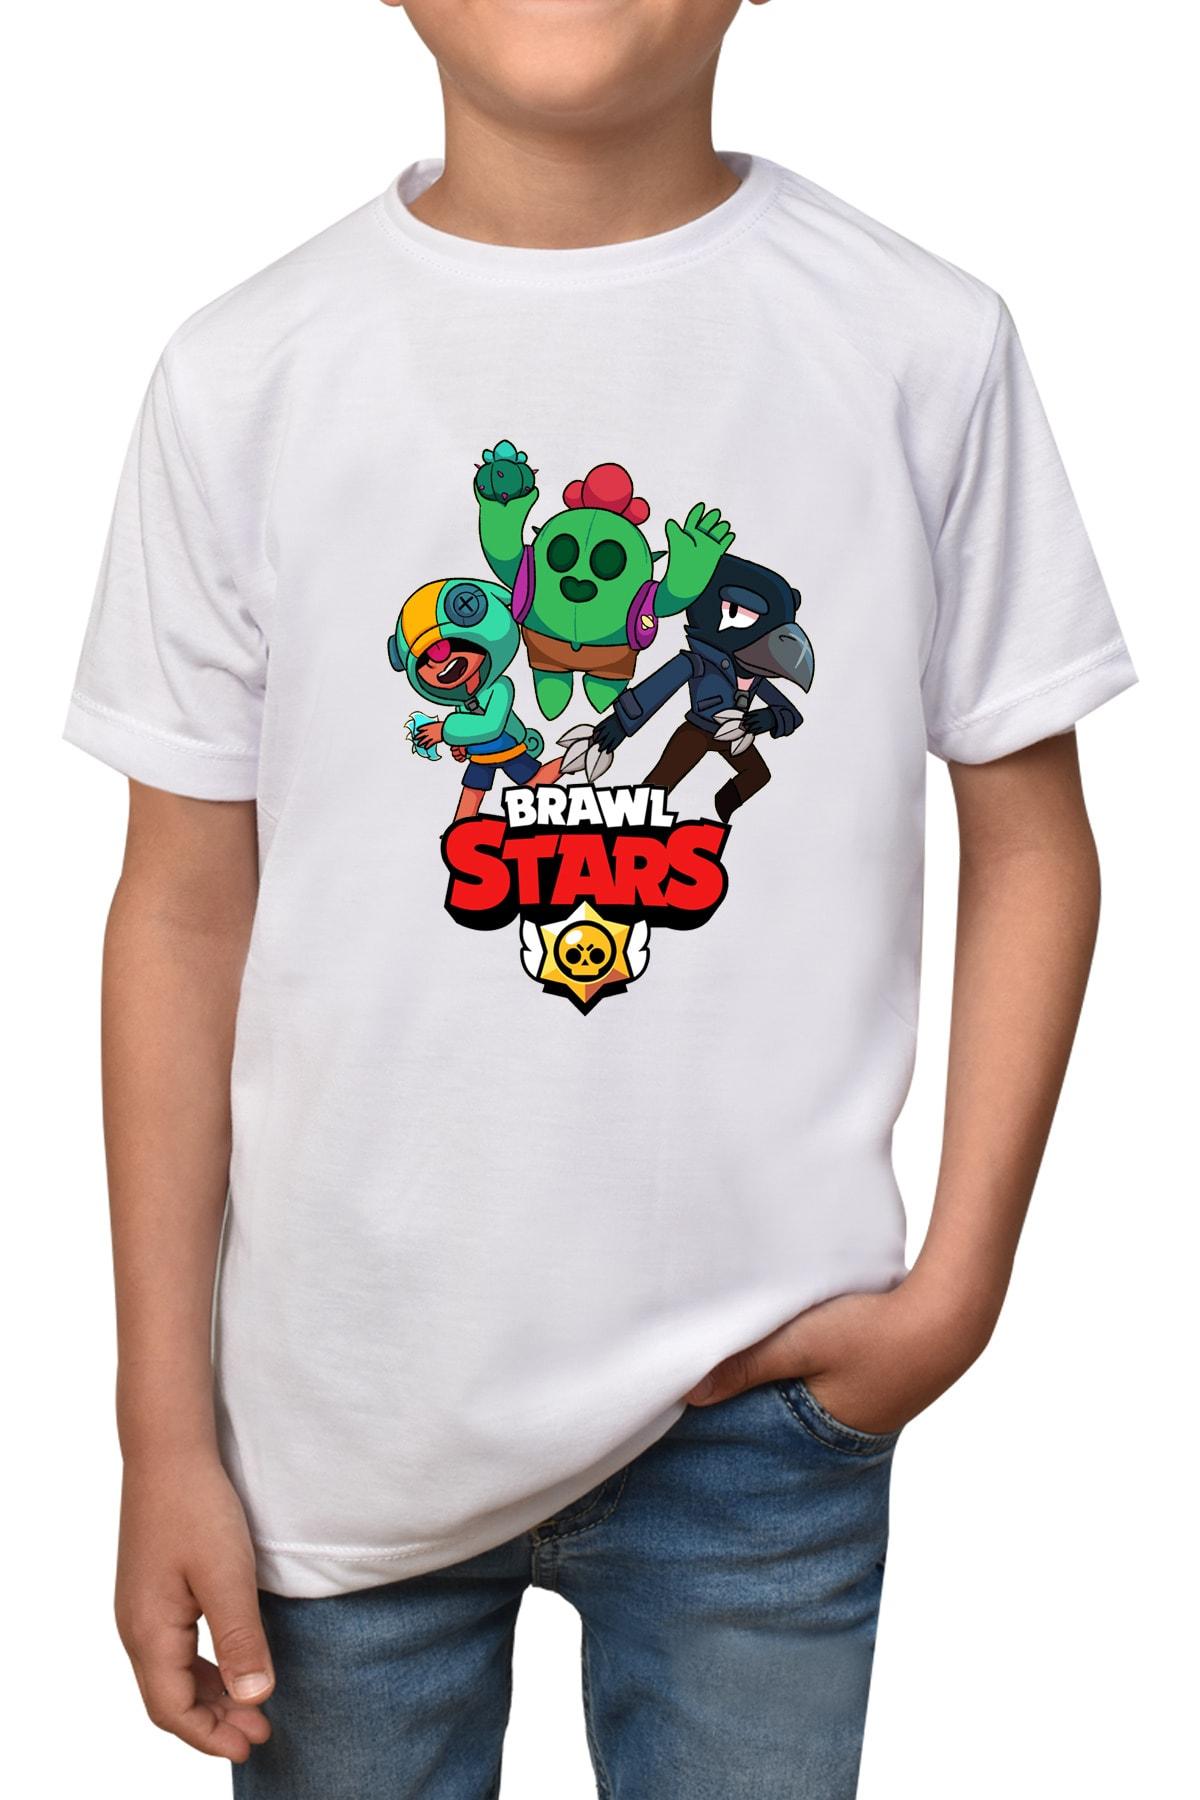 Brawl Stars - Beyaz Çocuk - Yetişkin Unisex T-shirt T-18